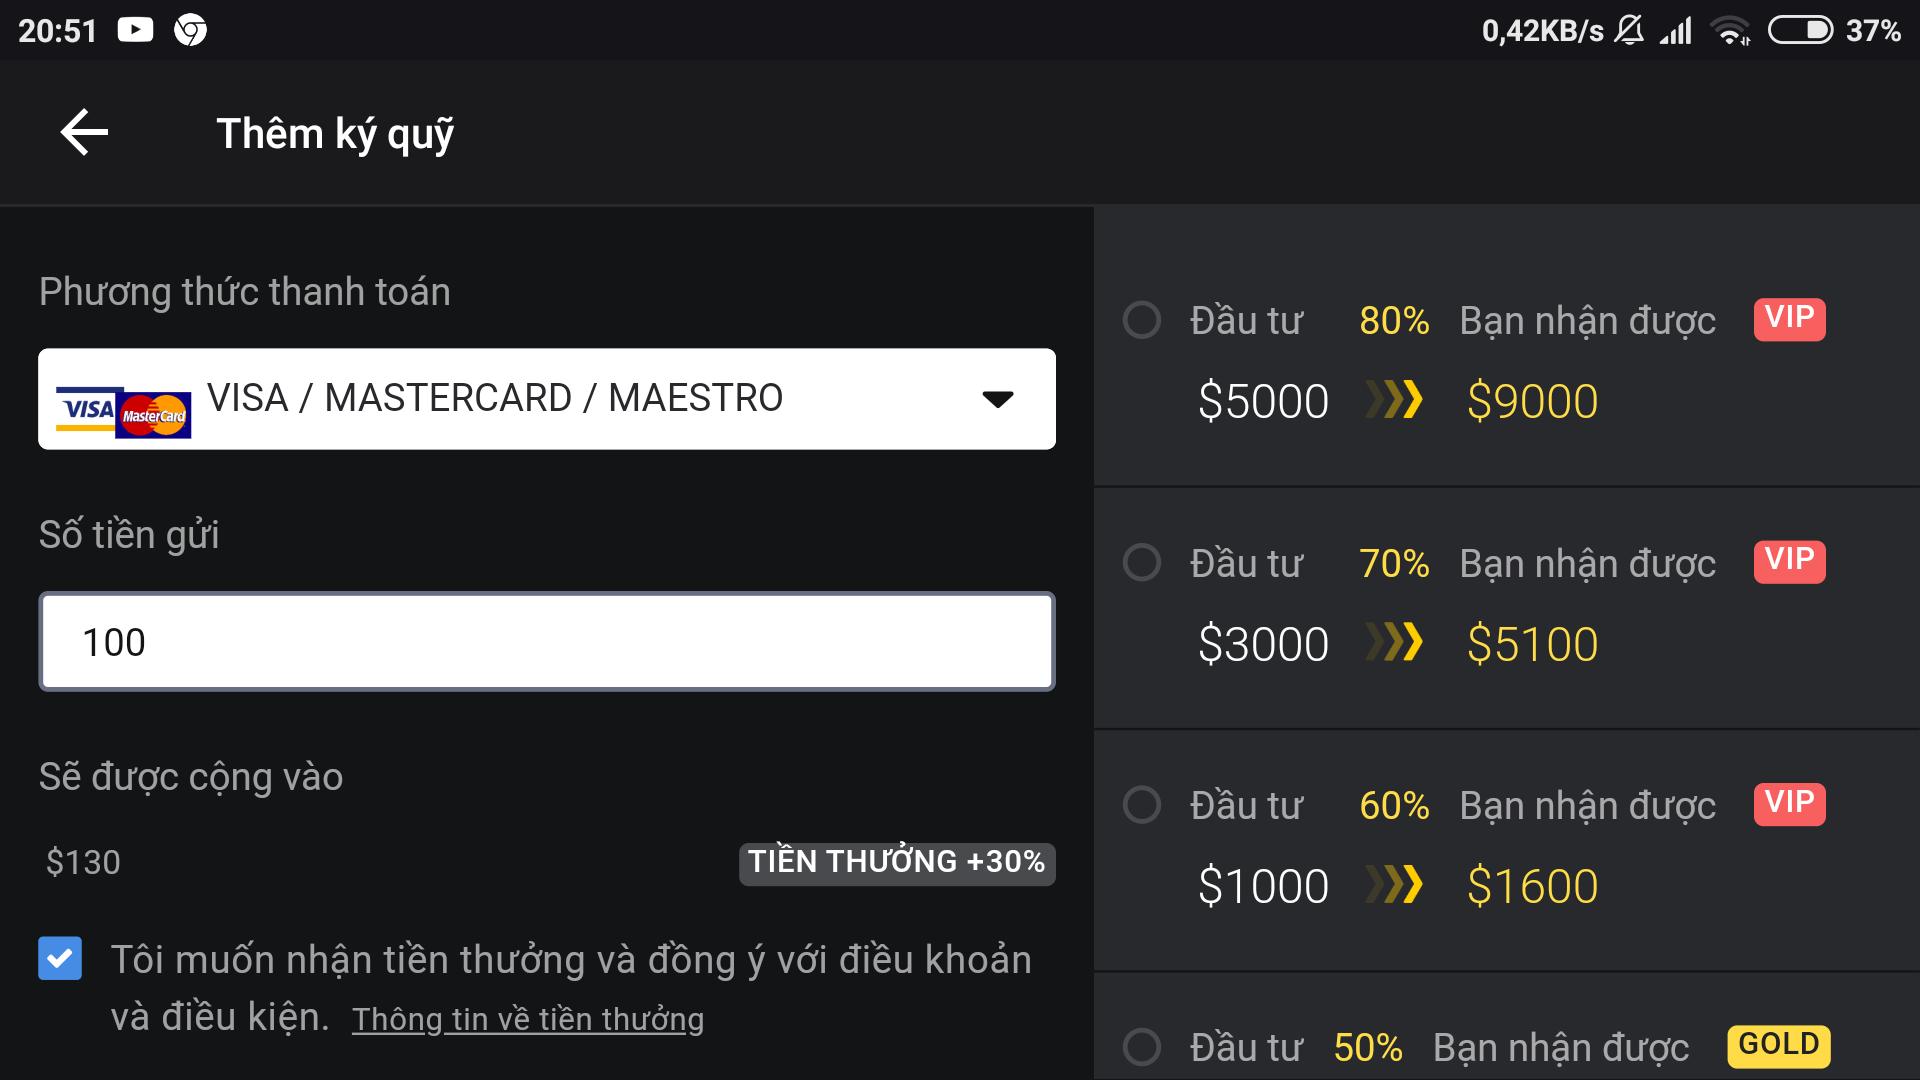 Screenshot_2018-08-02-20-51-12-031_com.binomo.broker.png